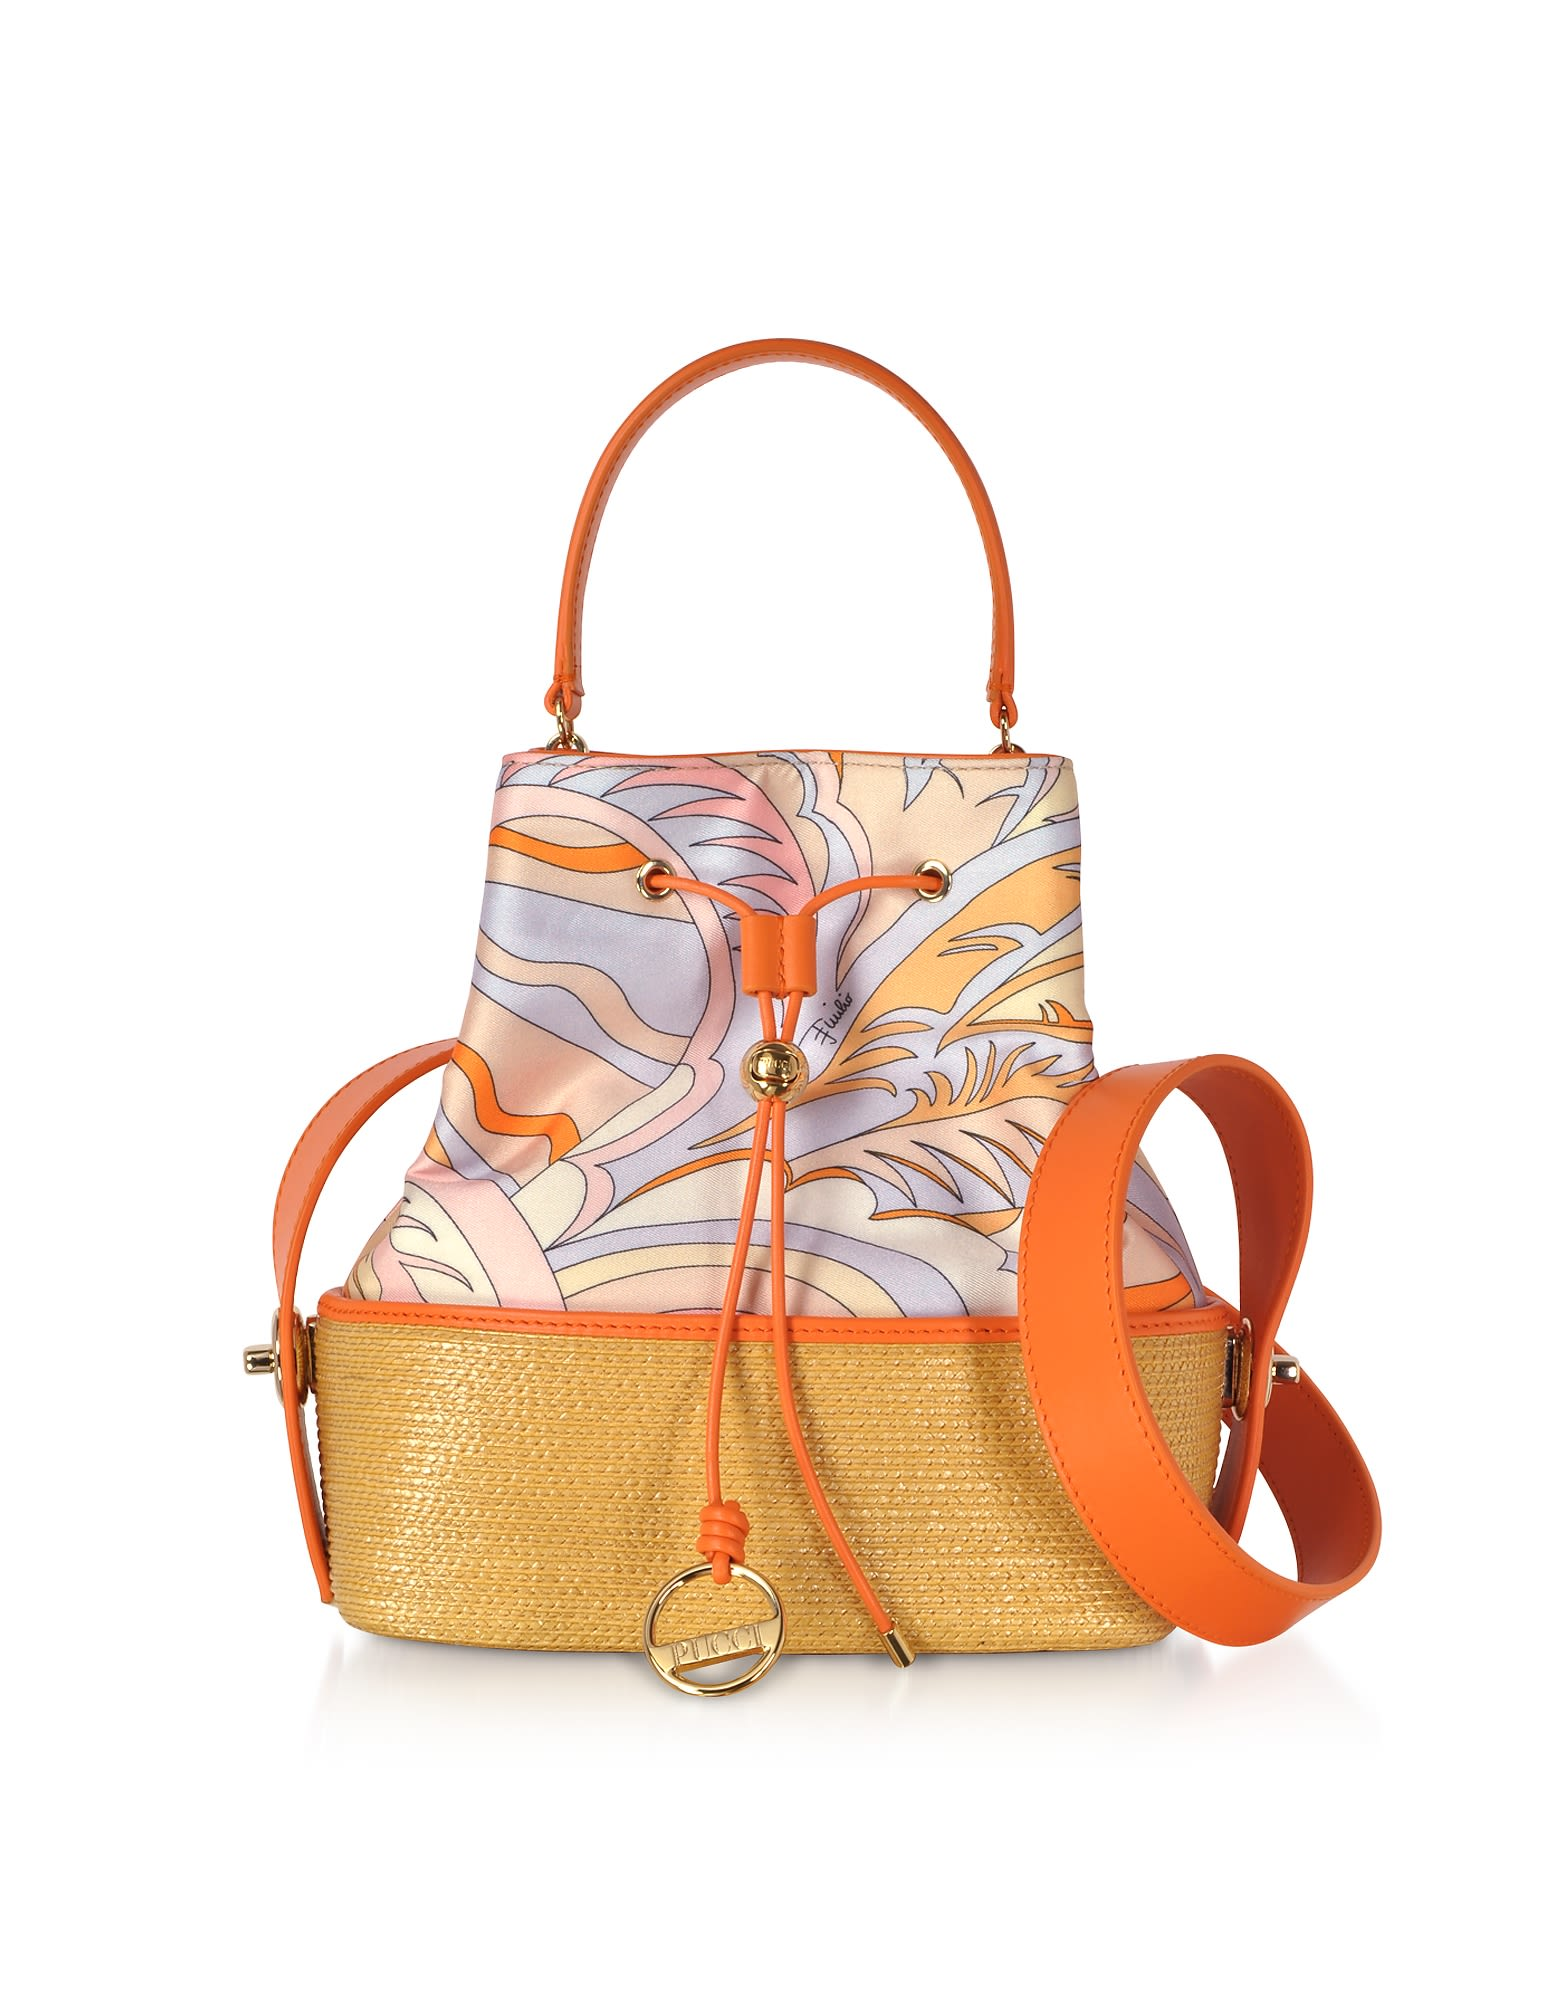 Emilio Pucci Viscose And Cotton Bucket Bag